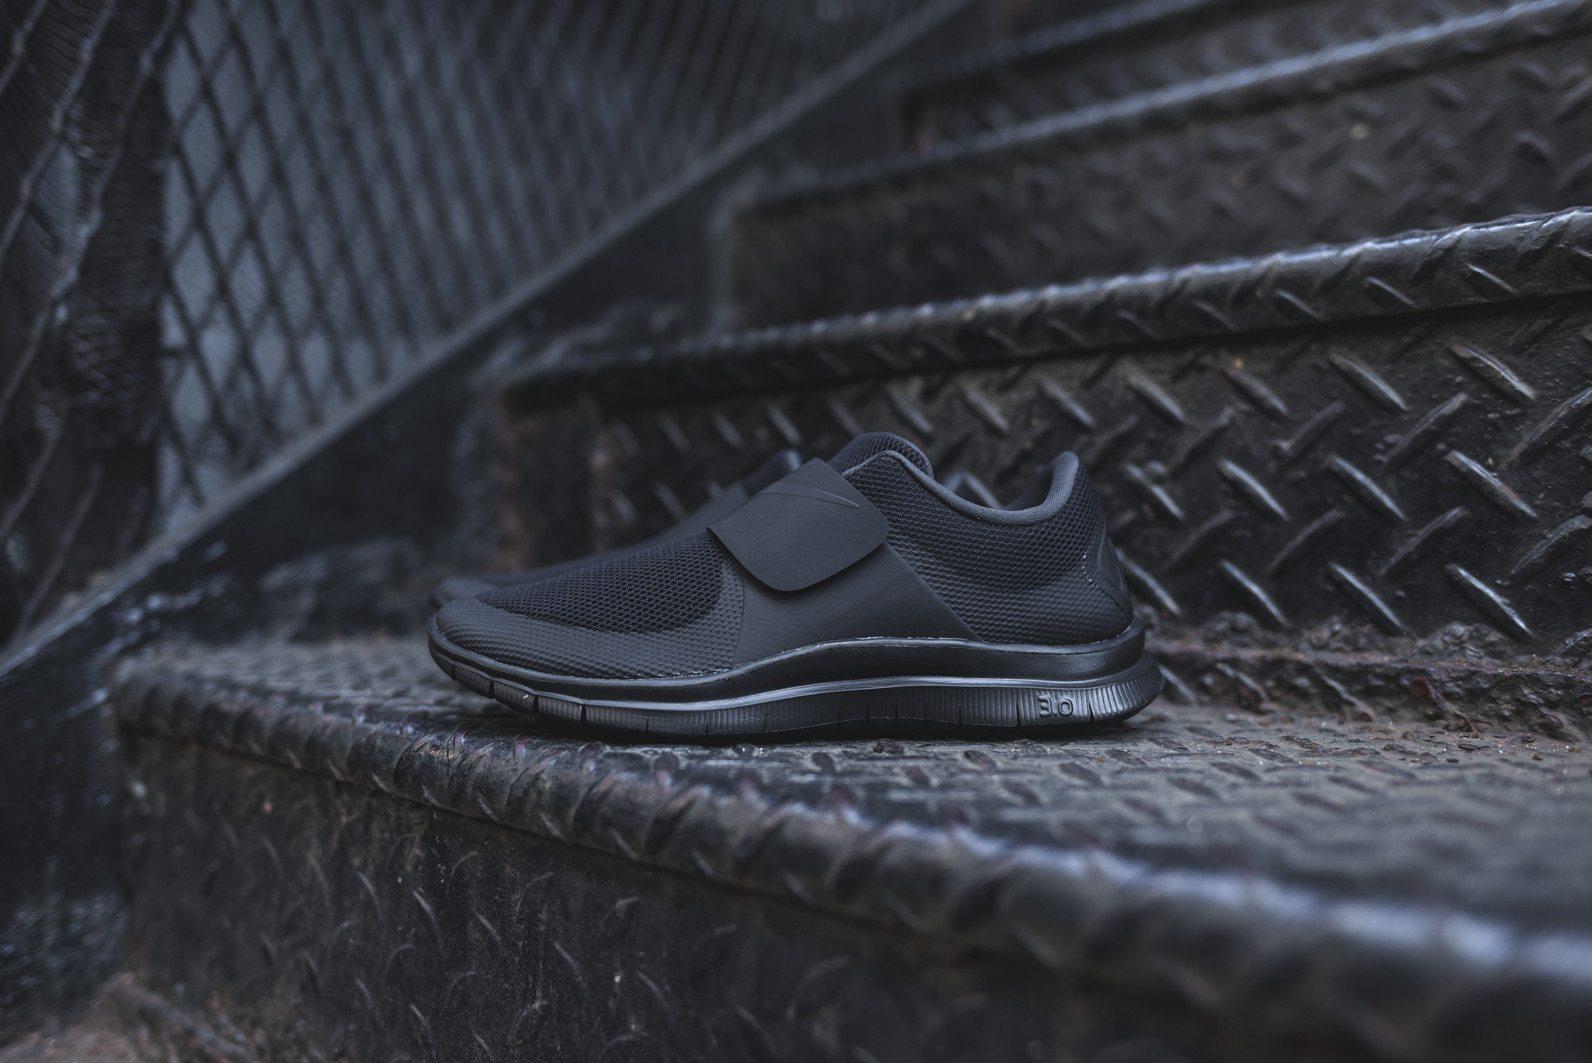 Nike Free Socfly Black Anthracite 2